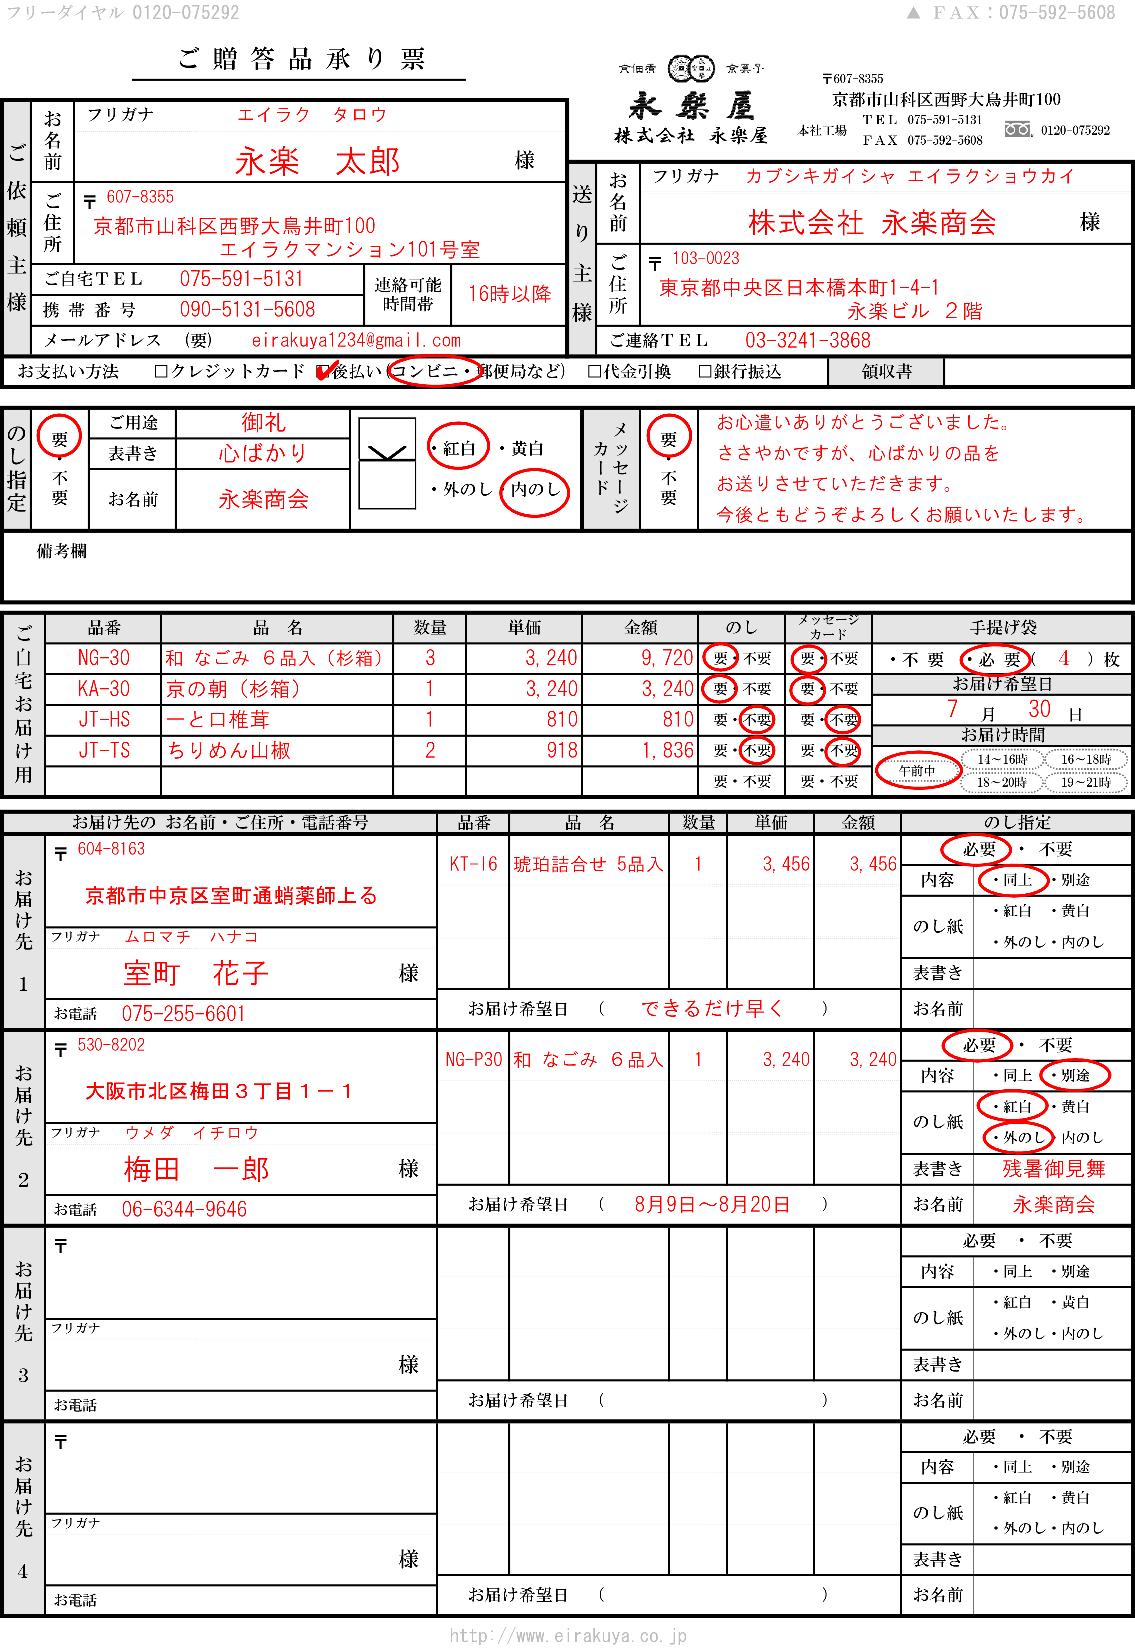 FAX注文用紙記入例